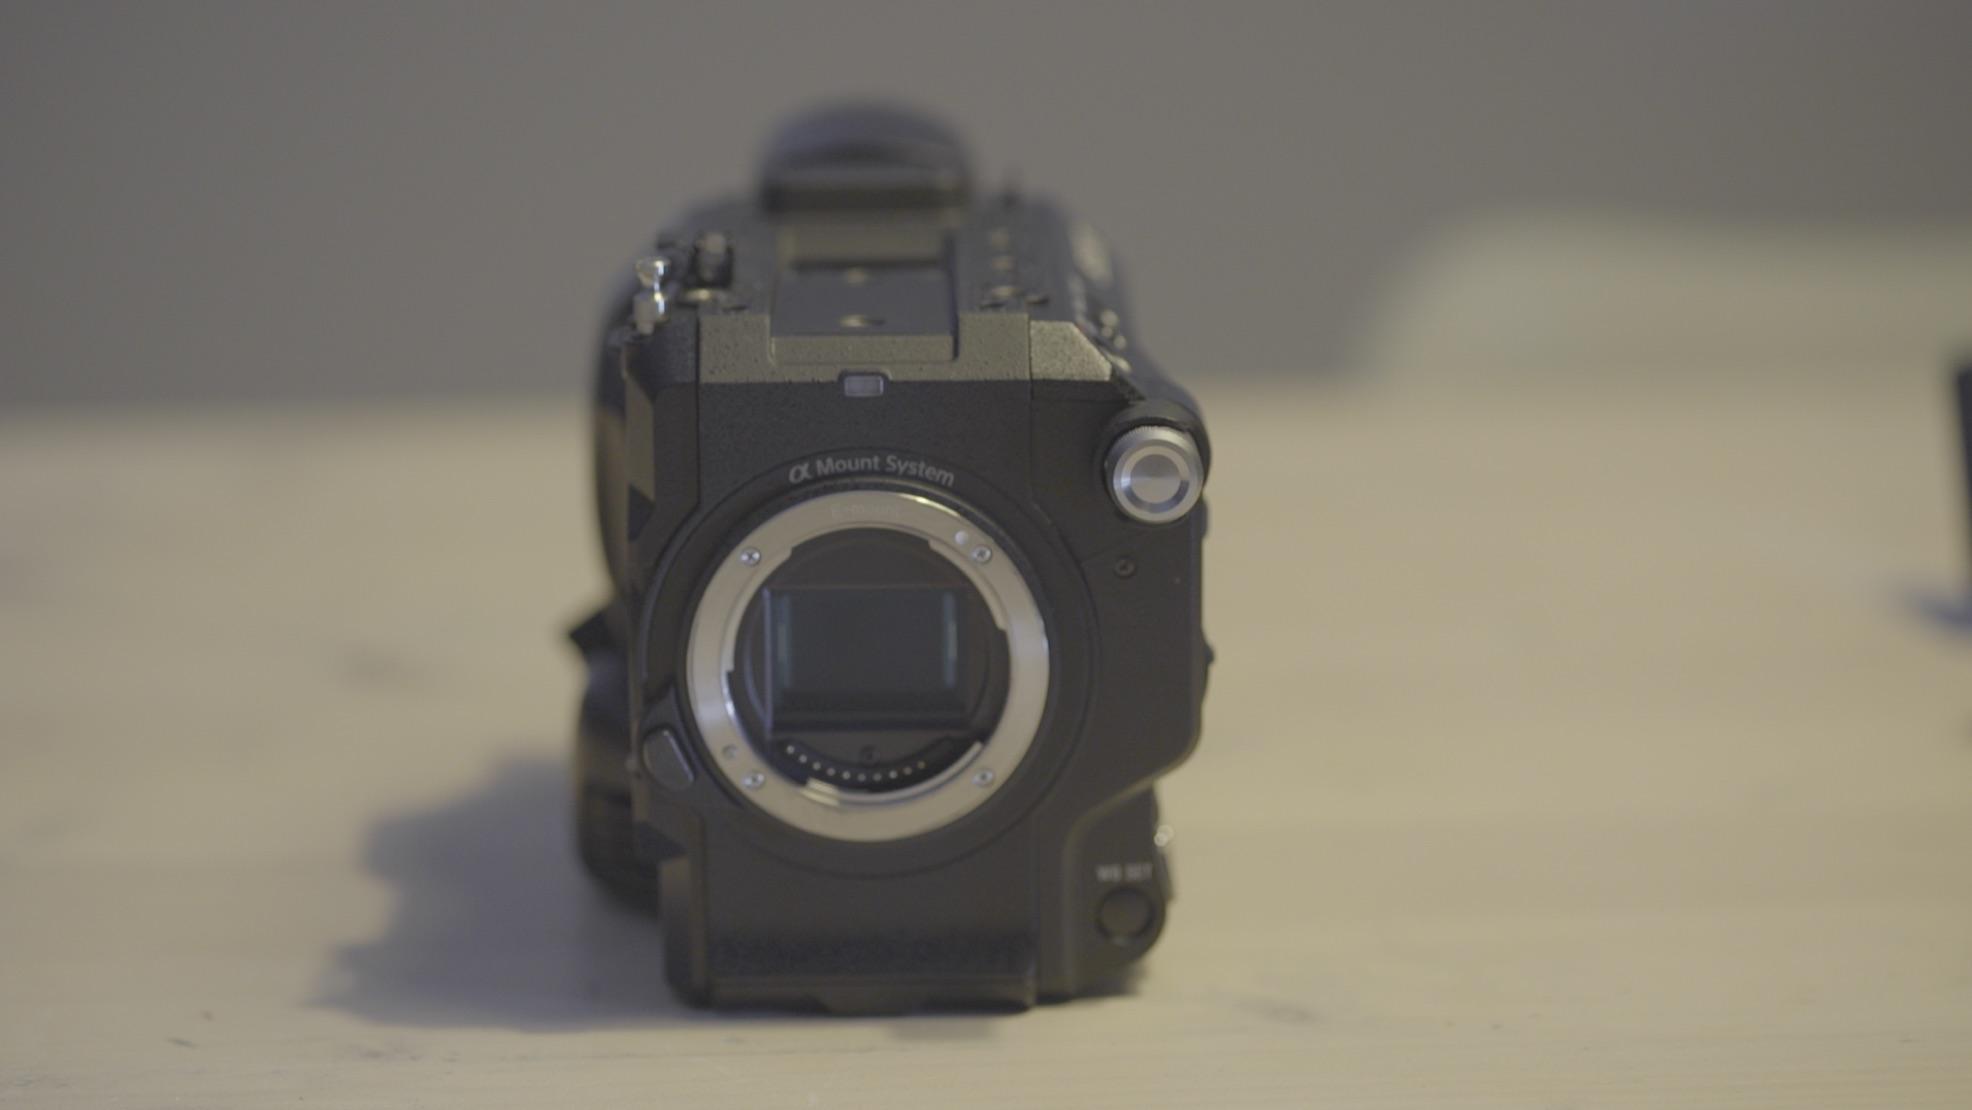 FS5-image_14